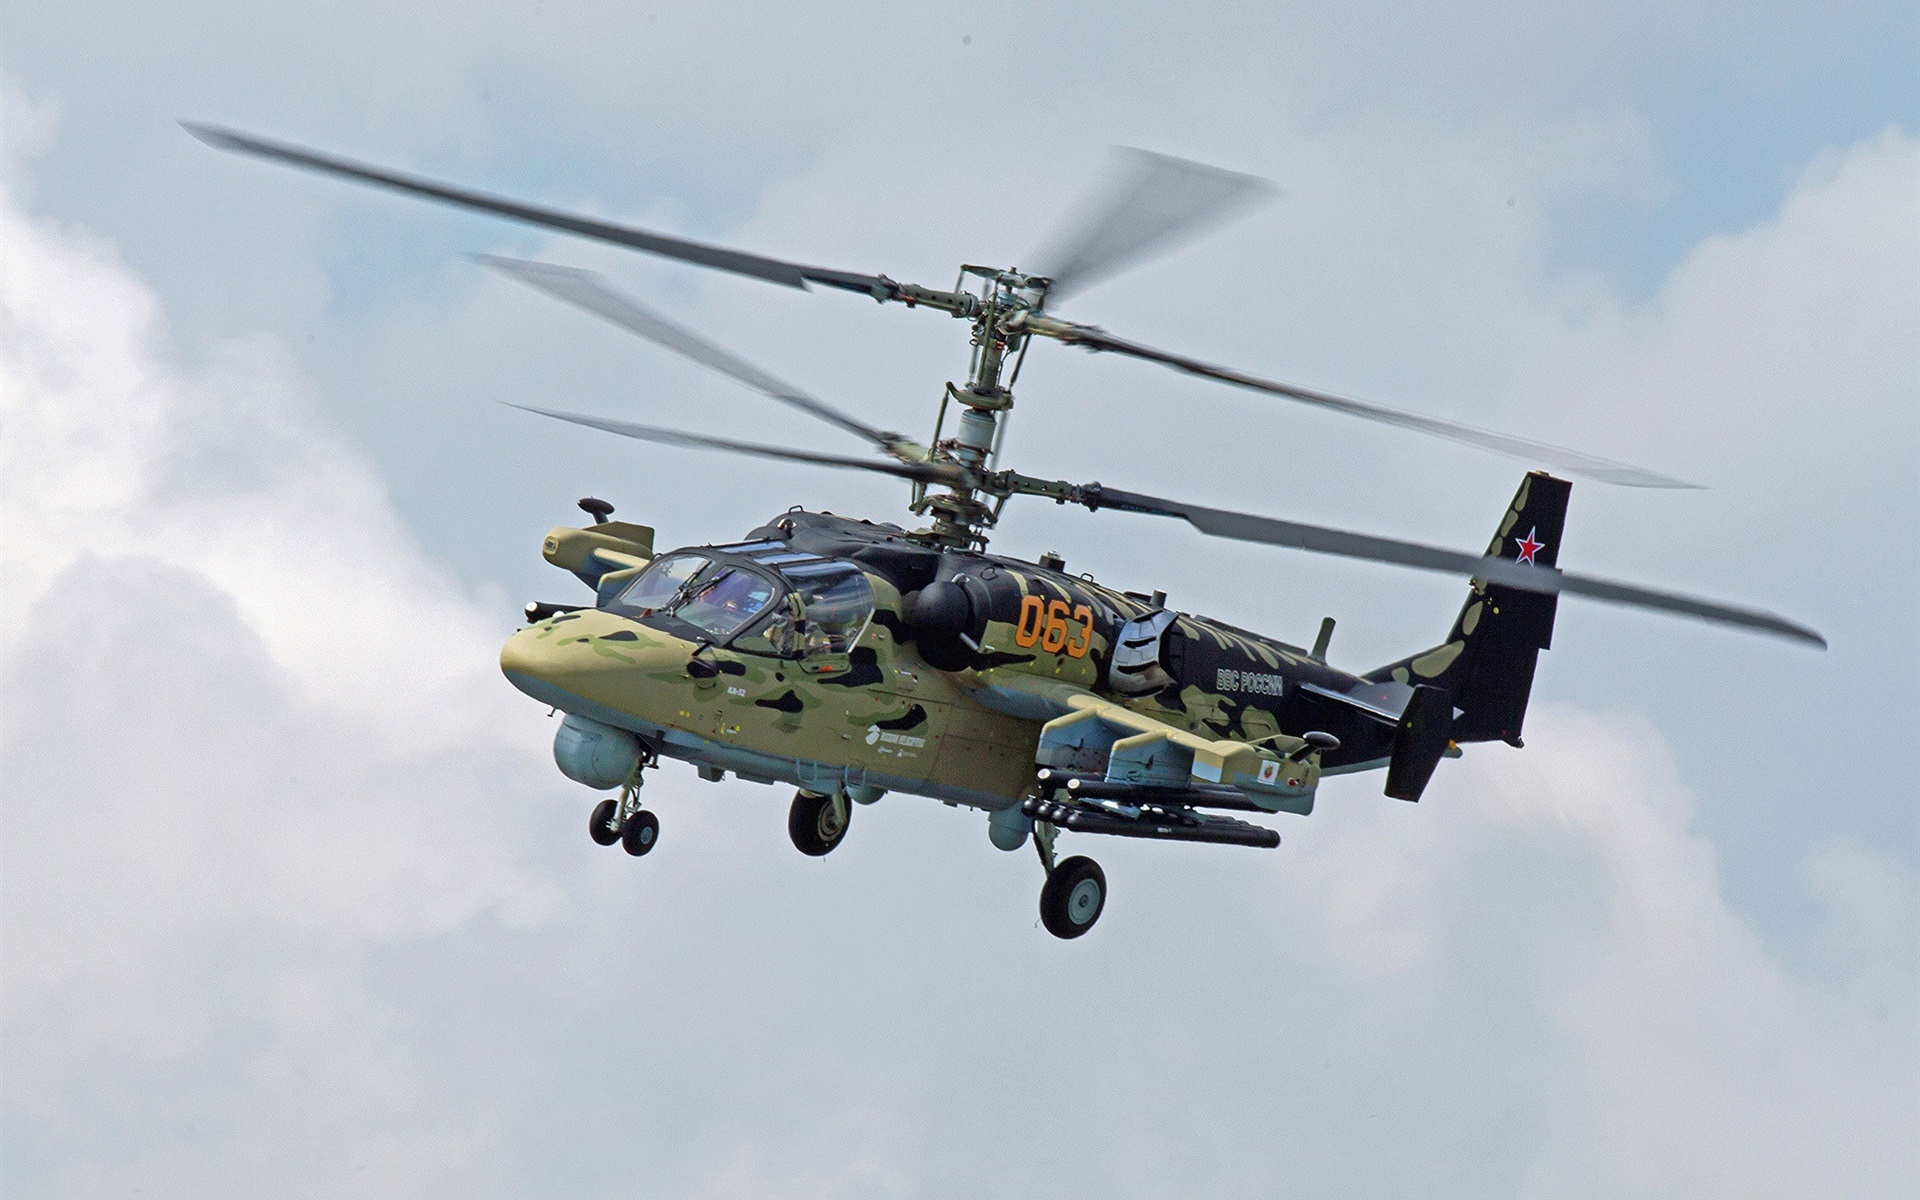 Elicottero Ka 52 : Ka helicopter russian wallpaper  resolution